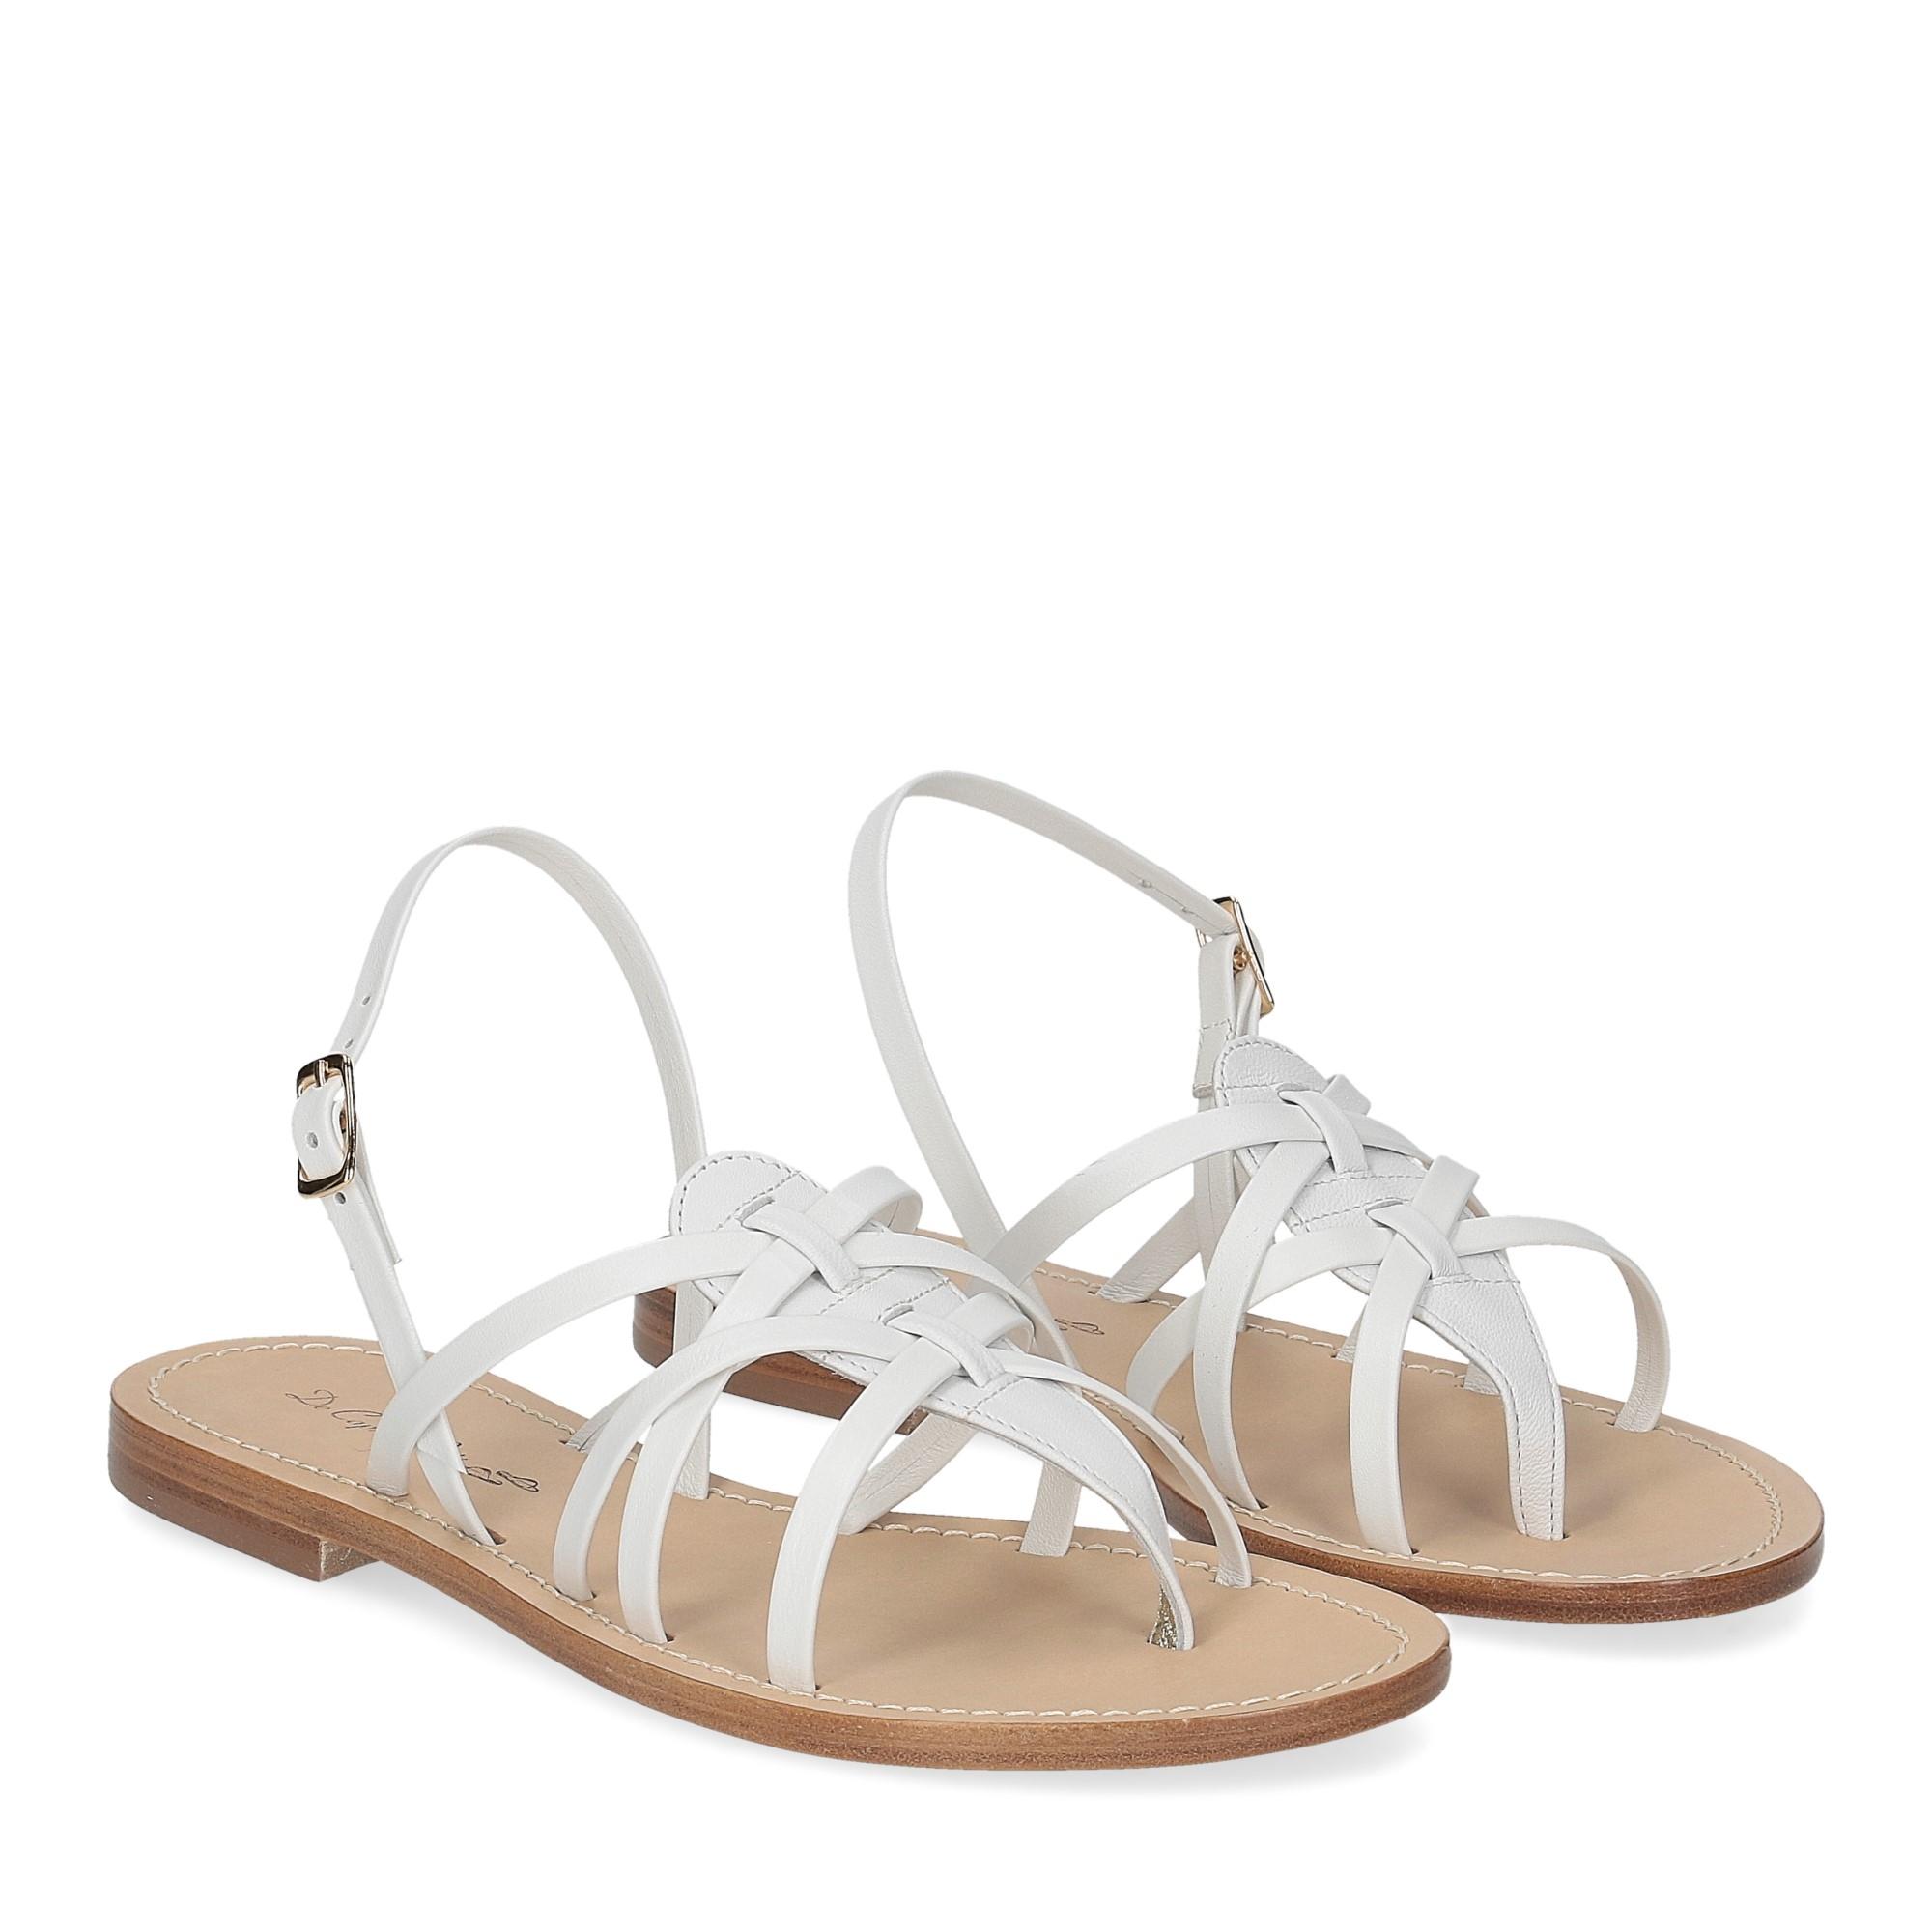 De Capri a Paris sandalo infradito pelle bianca